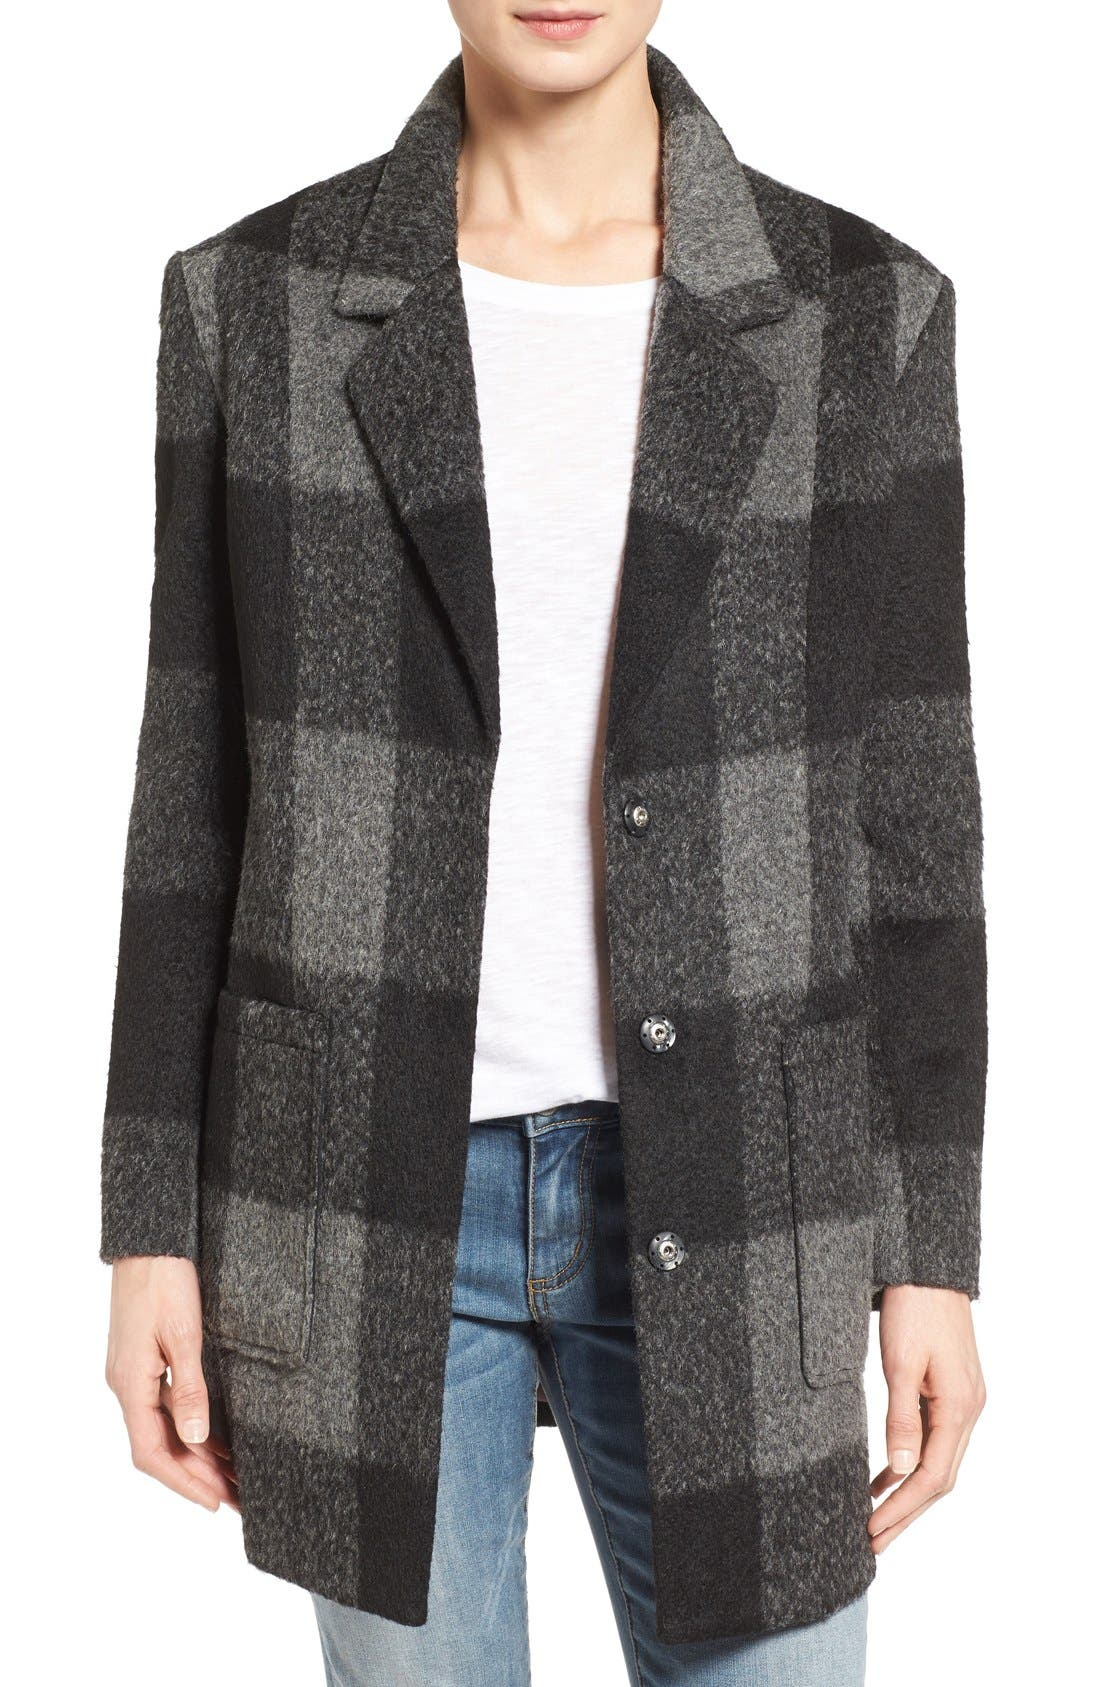 Alternate Image 1 Selected - Levi's® Plaid Jacket